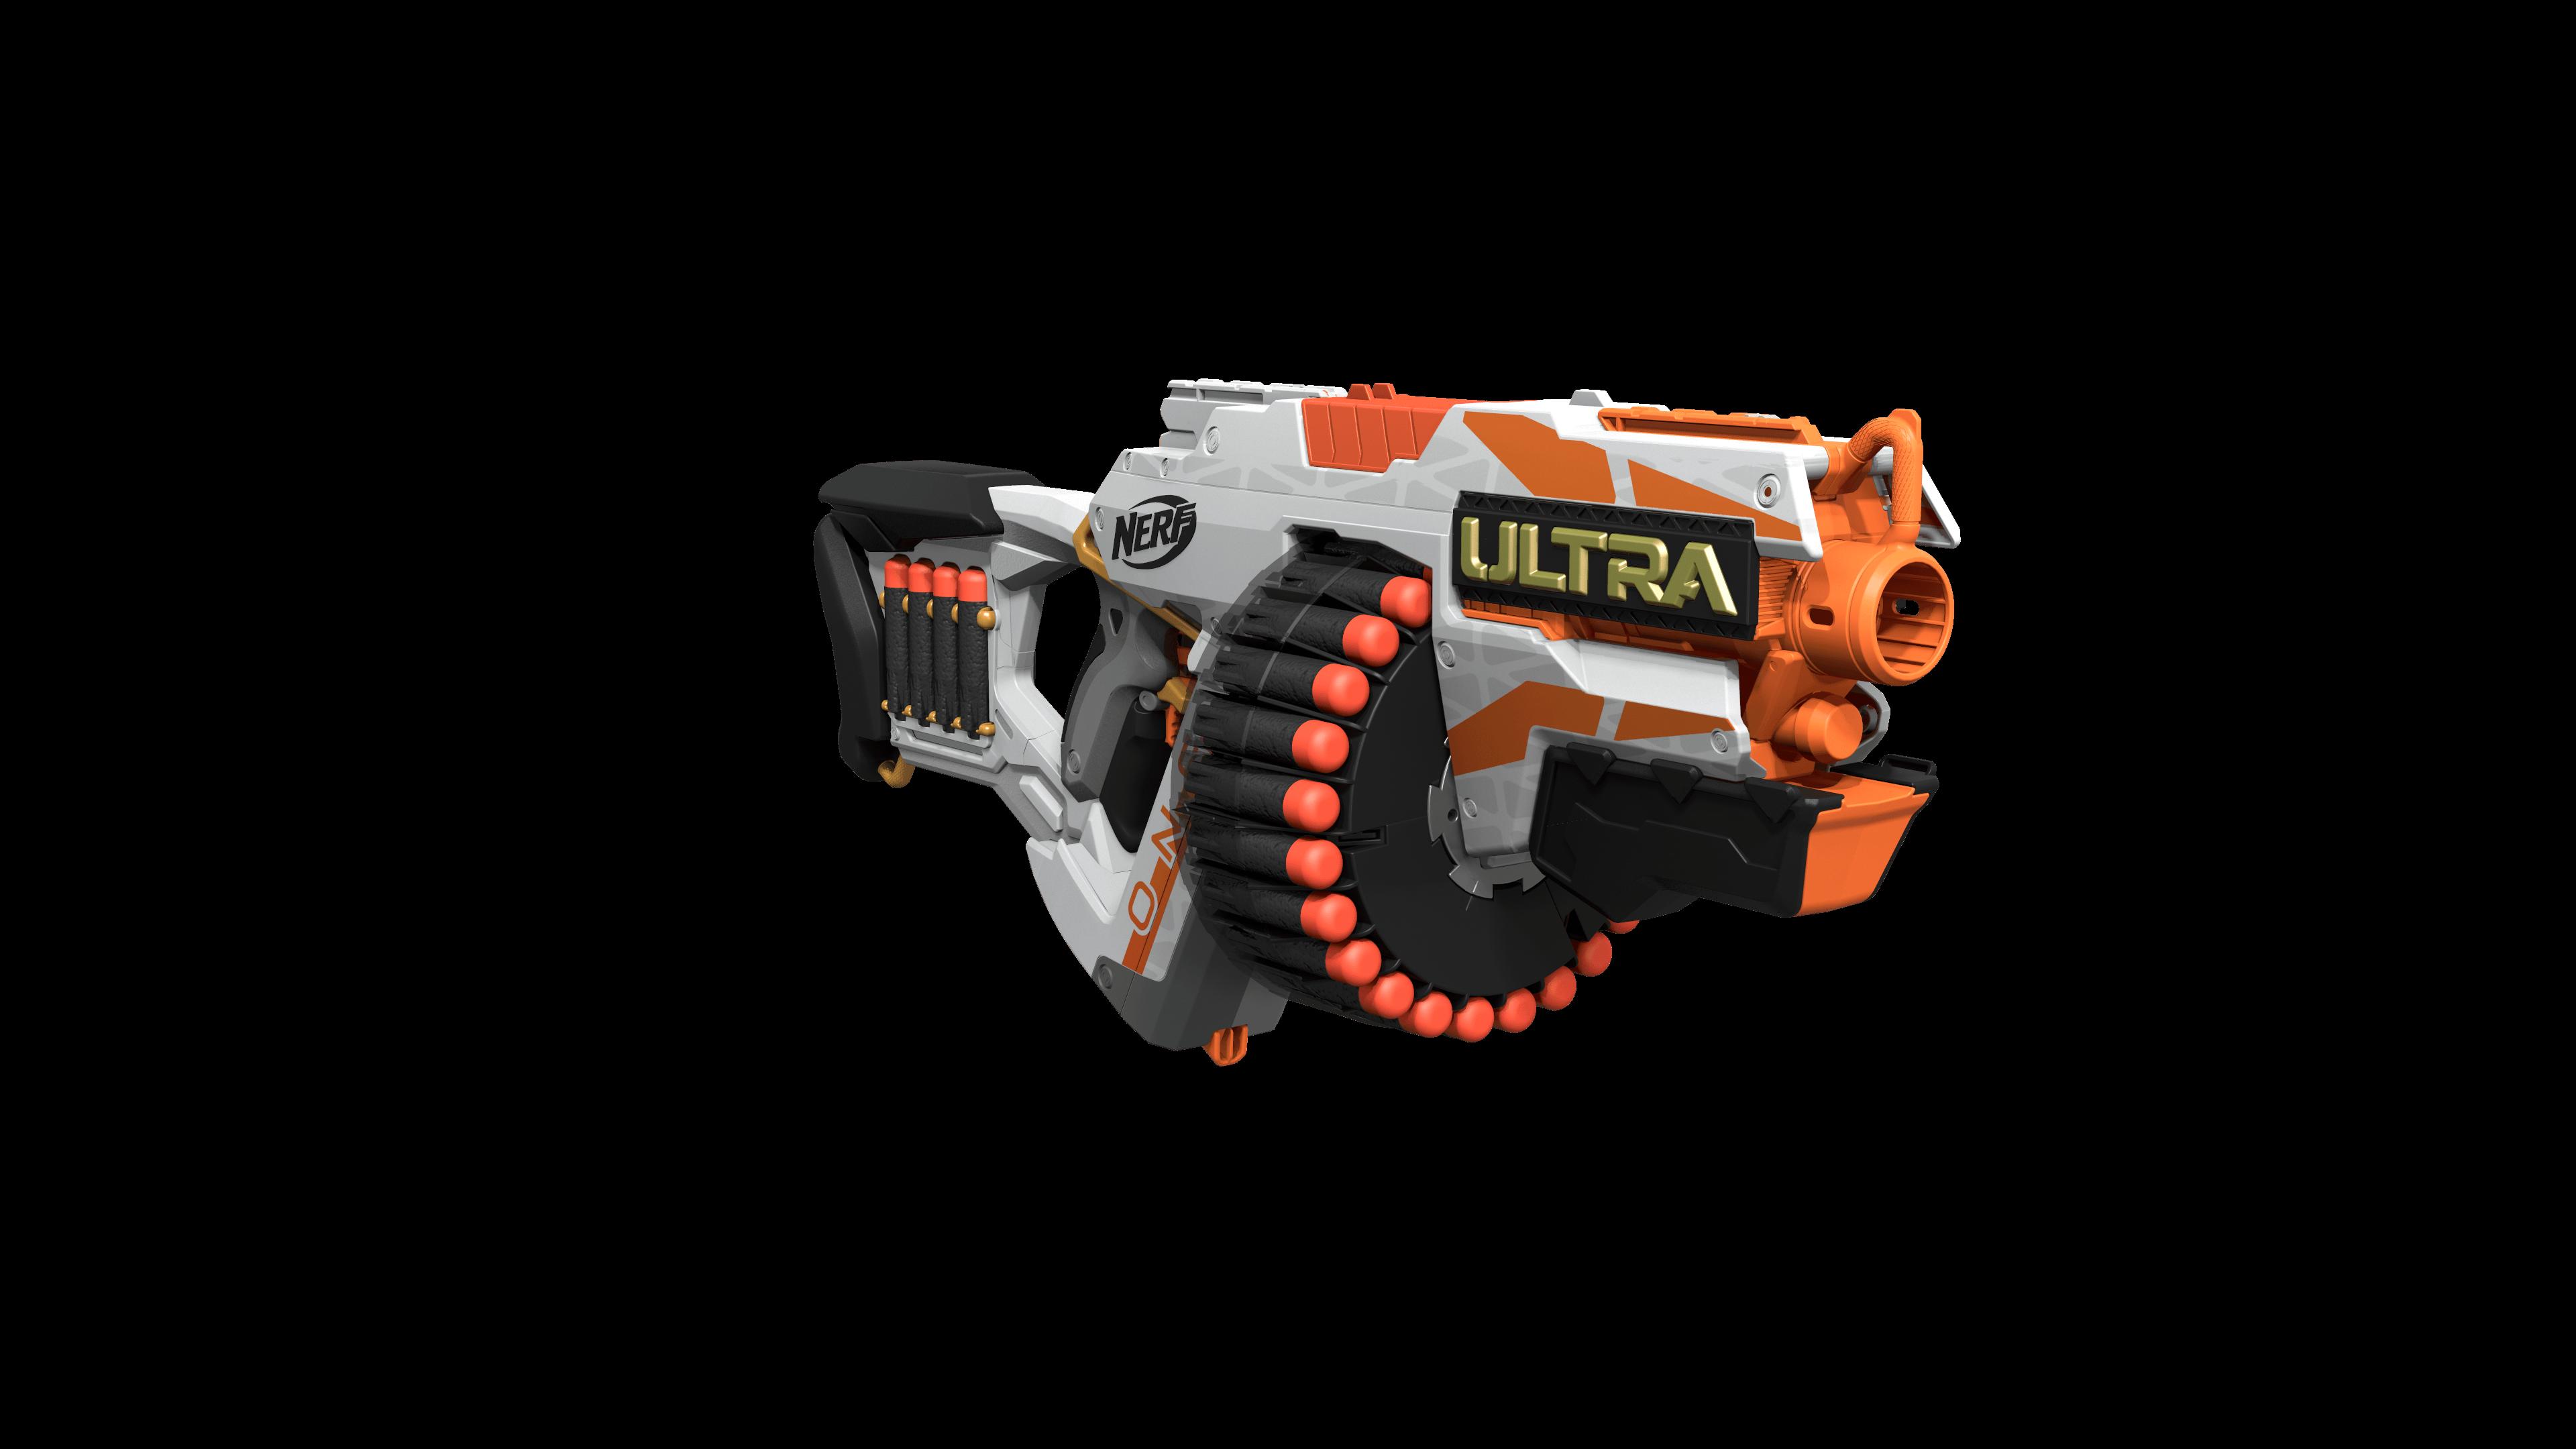 ultra blaster img 105